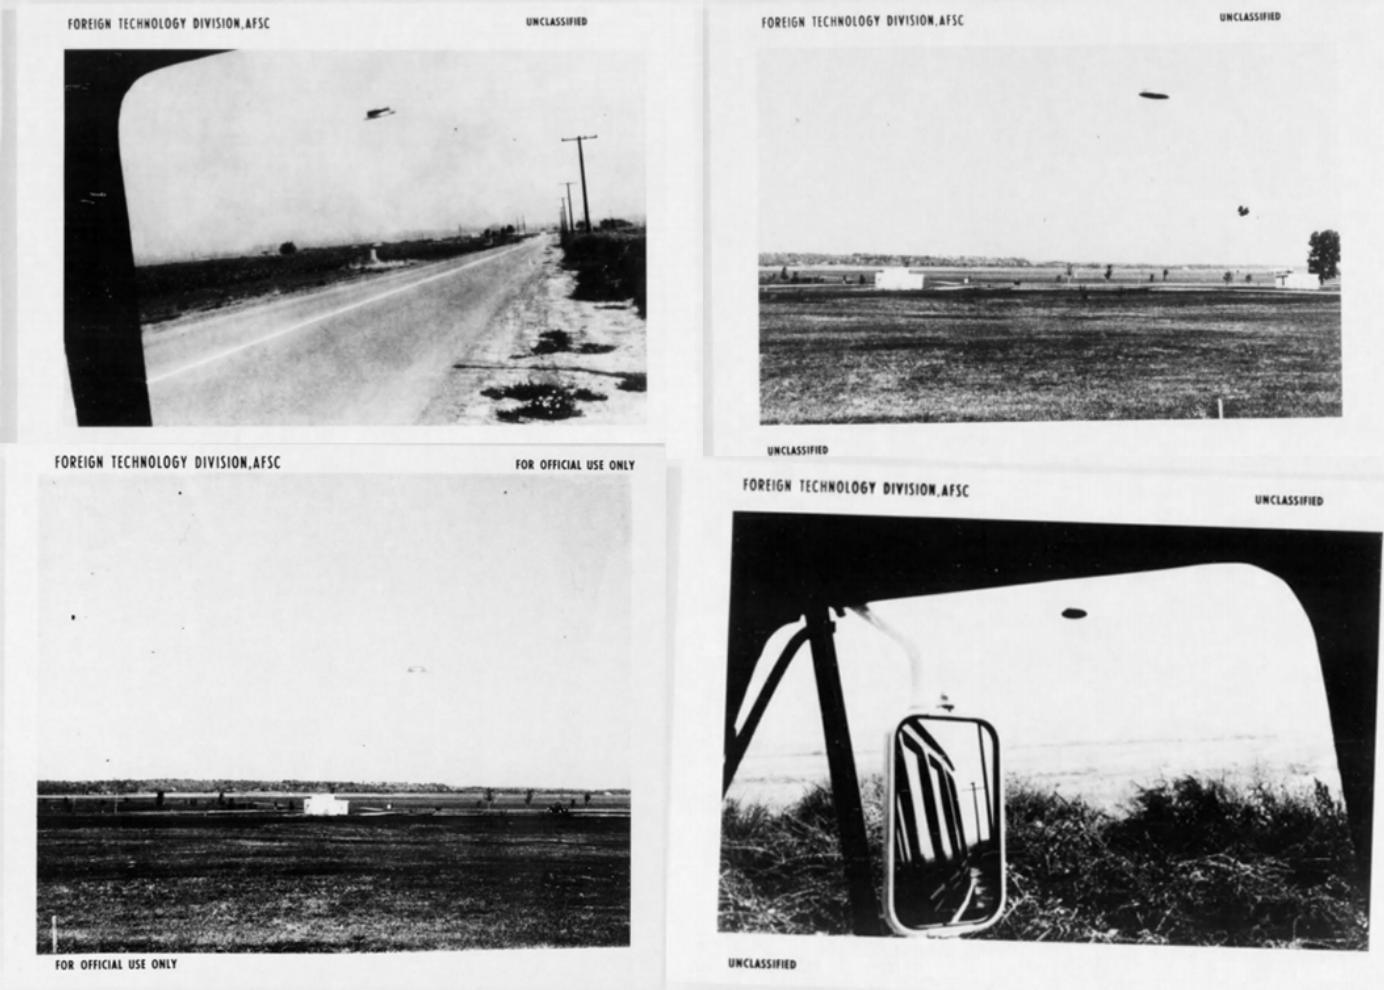 Propaganda of Project Blue Book | The Best Photos Of 'UFOs'  B080d5c543ab4b17878c7adcf16c74aa_1d3a8a60b2f440359d967db7ad0f1a08_1_original